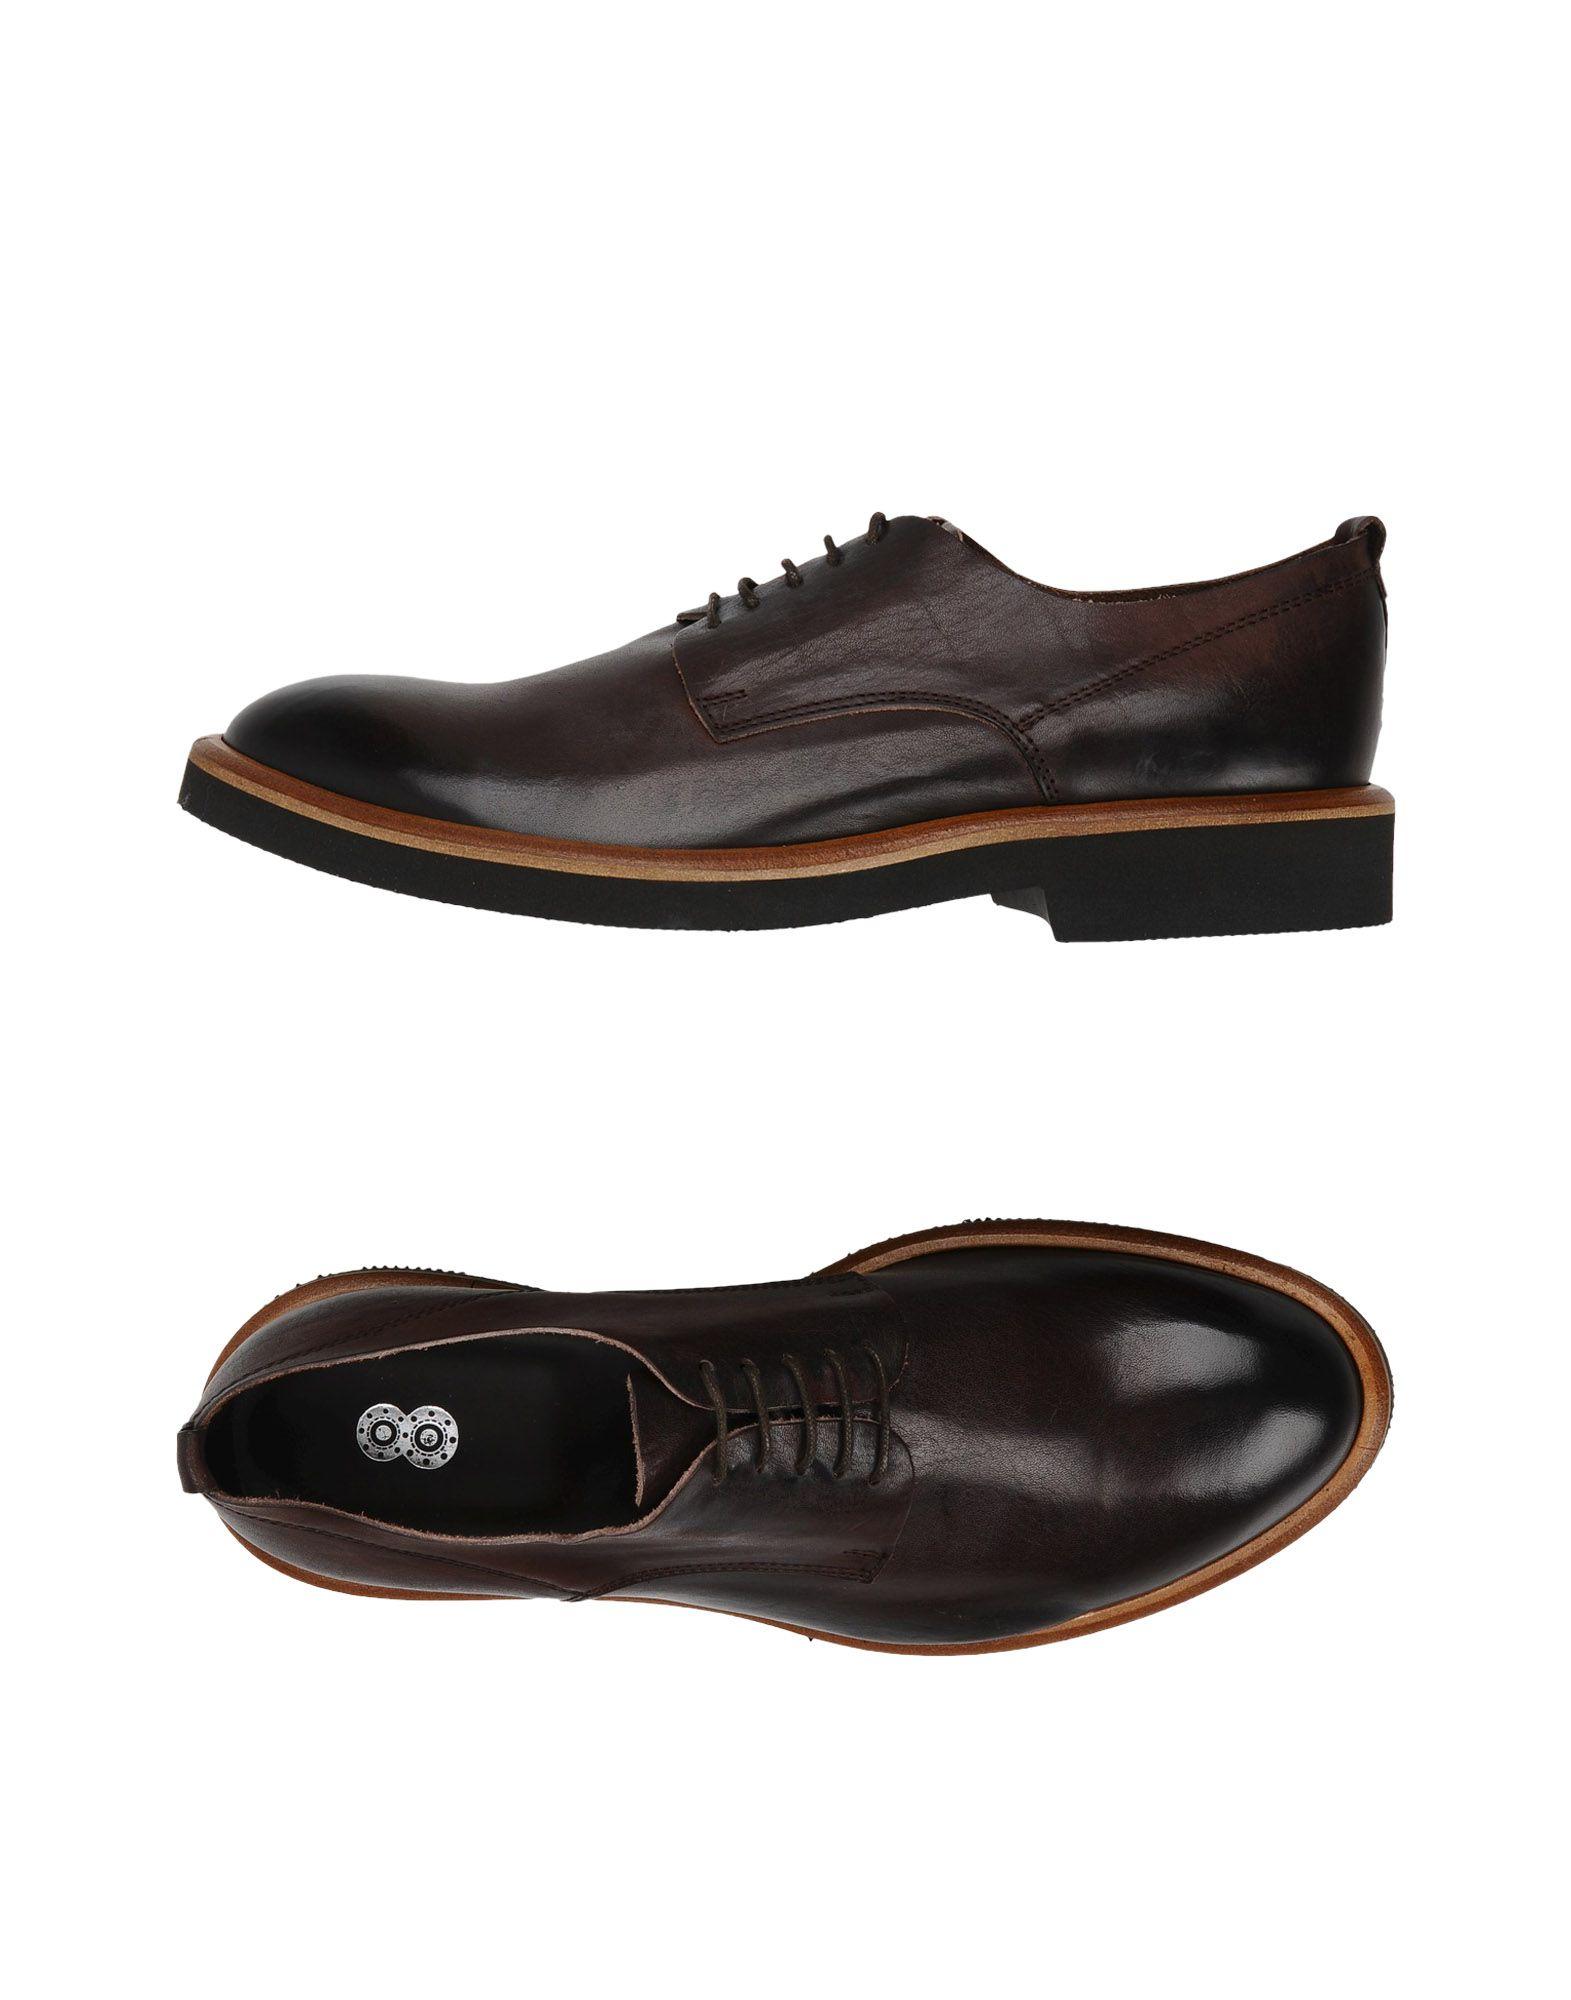 Rabatt echte Schuhe 8 Schnürschuhe Herren  11449877IL